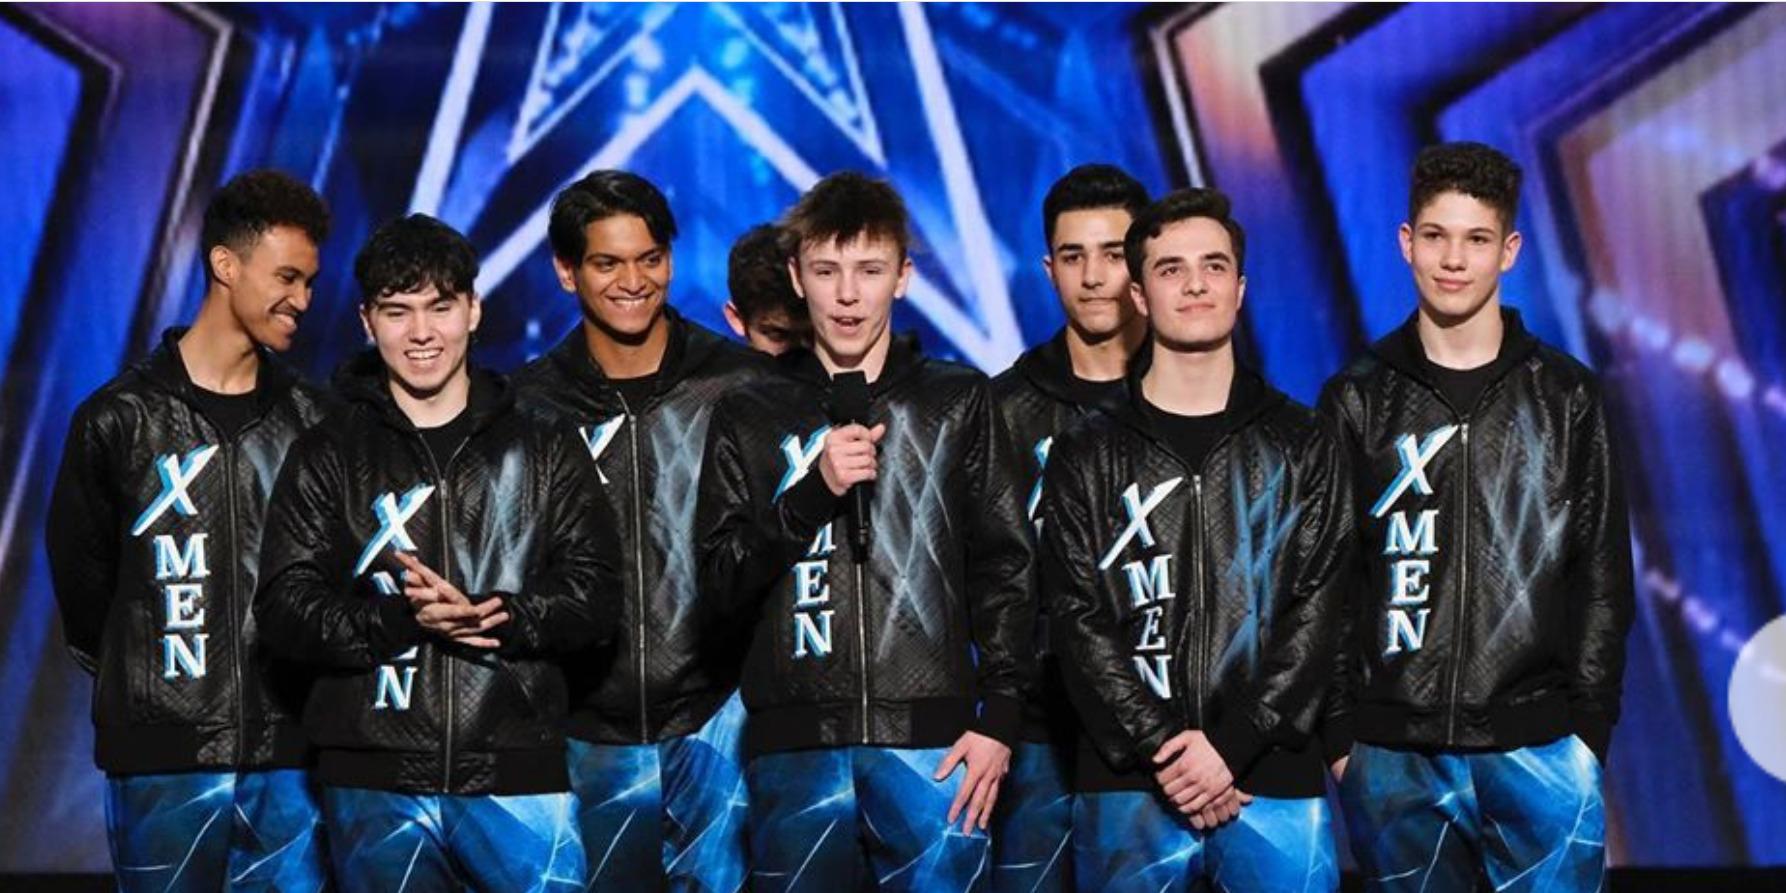 Xtreme Dance Force America's Got Talent